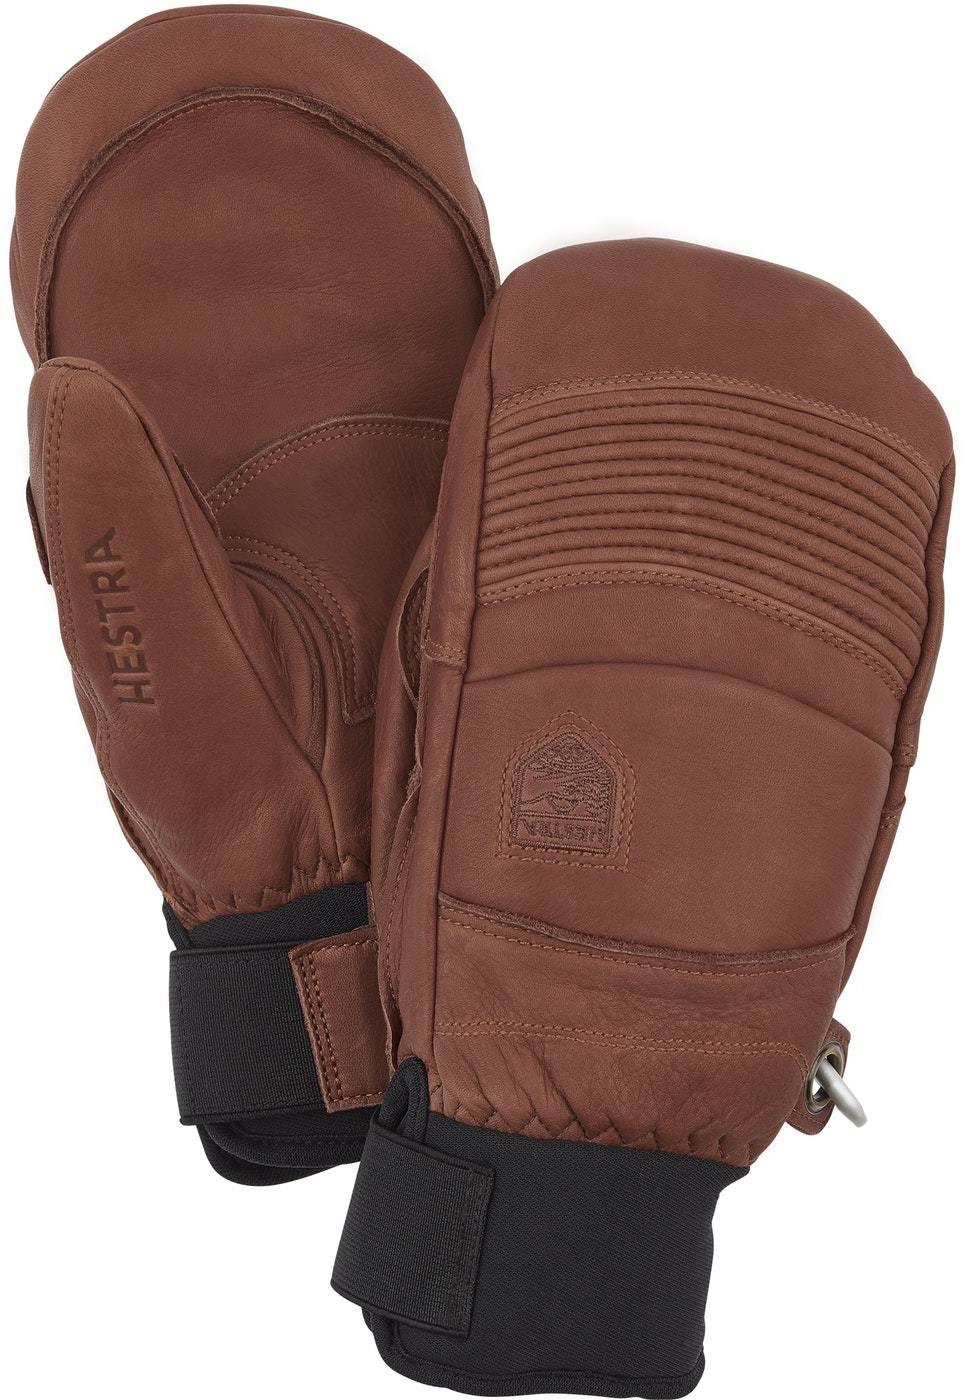 Leather Fall LIne Mitt - 31471-750